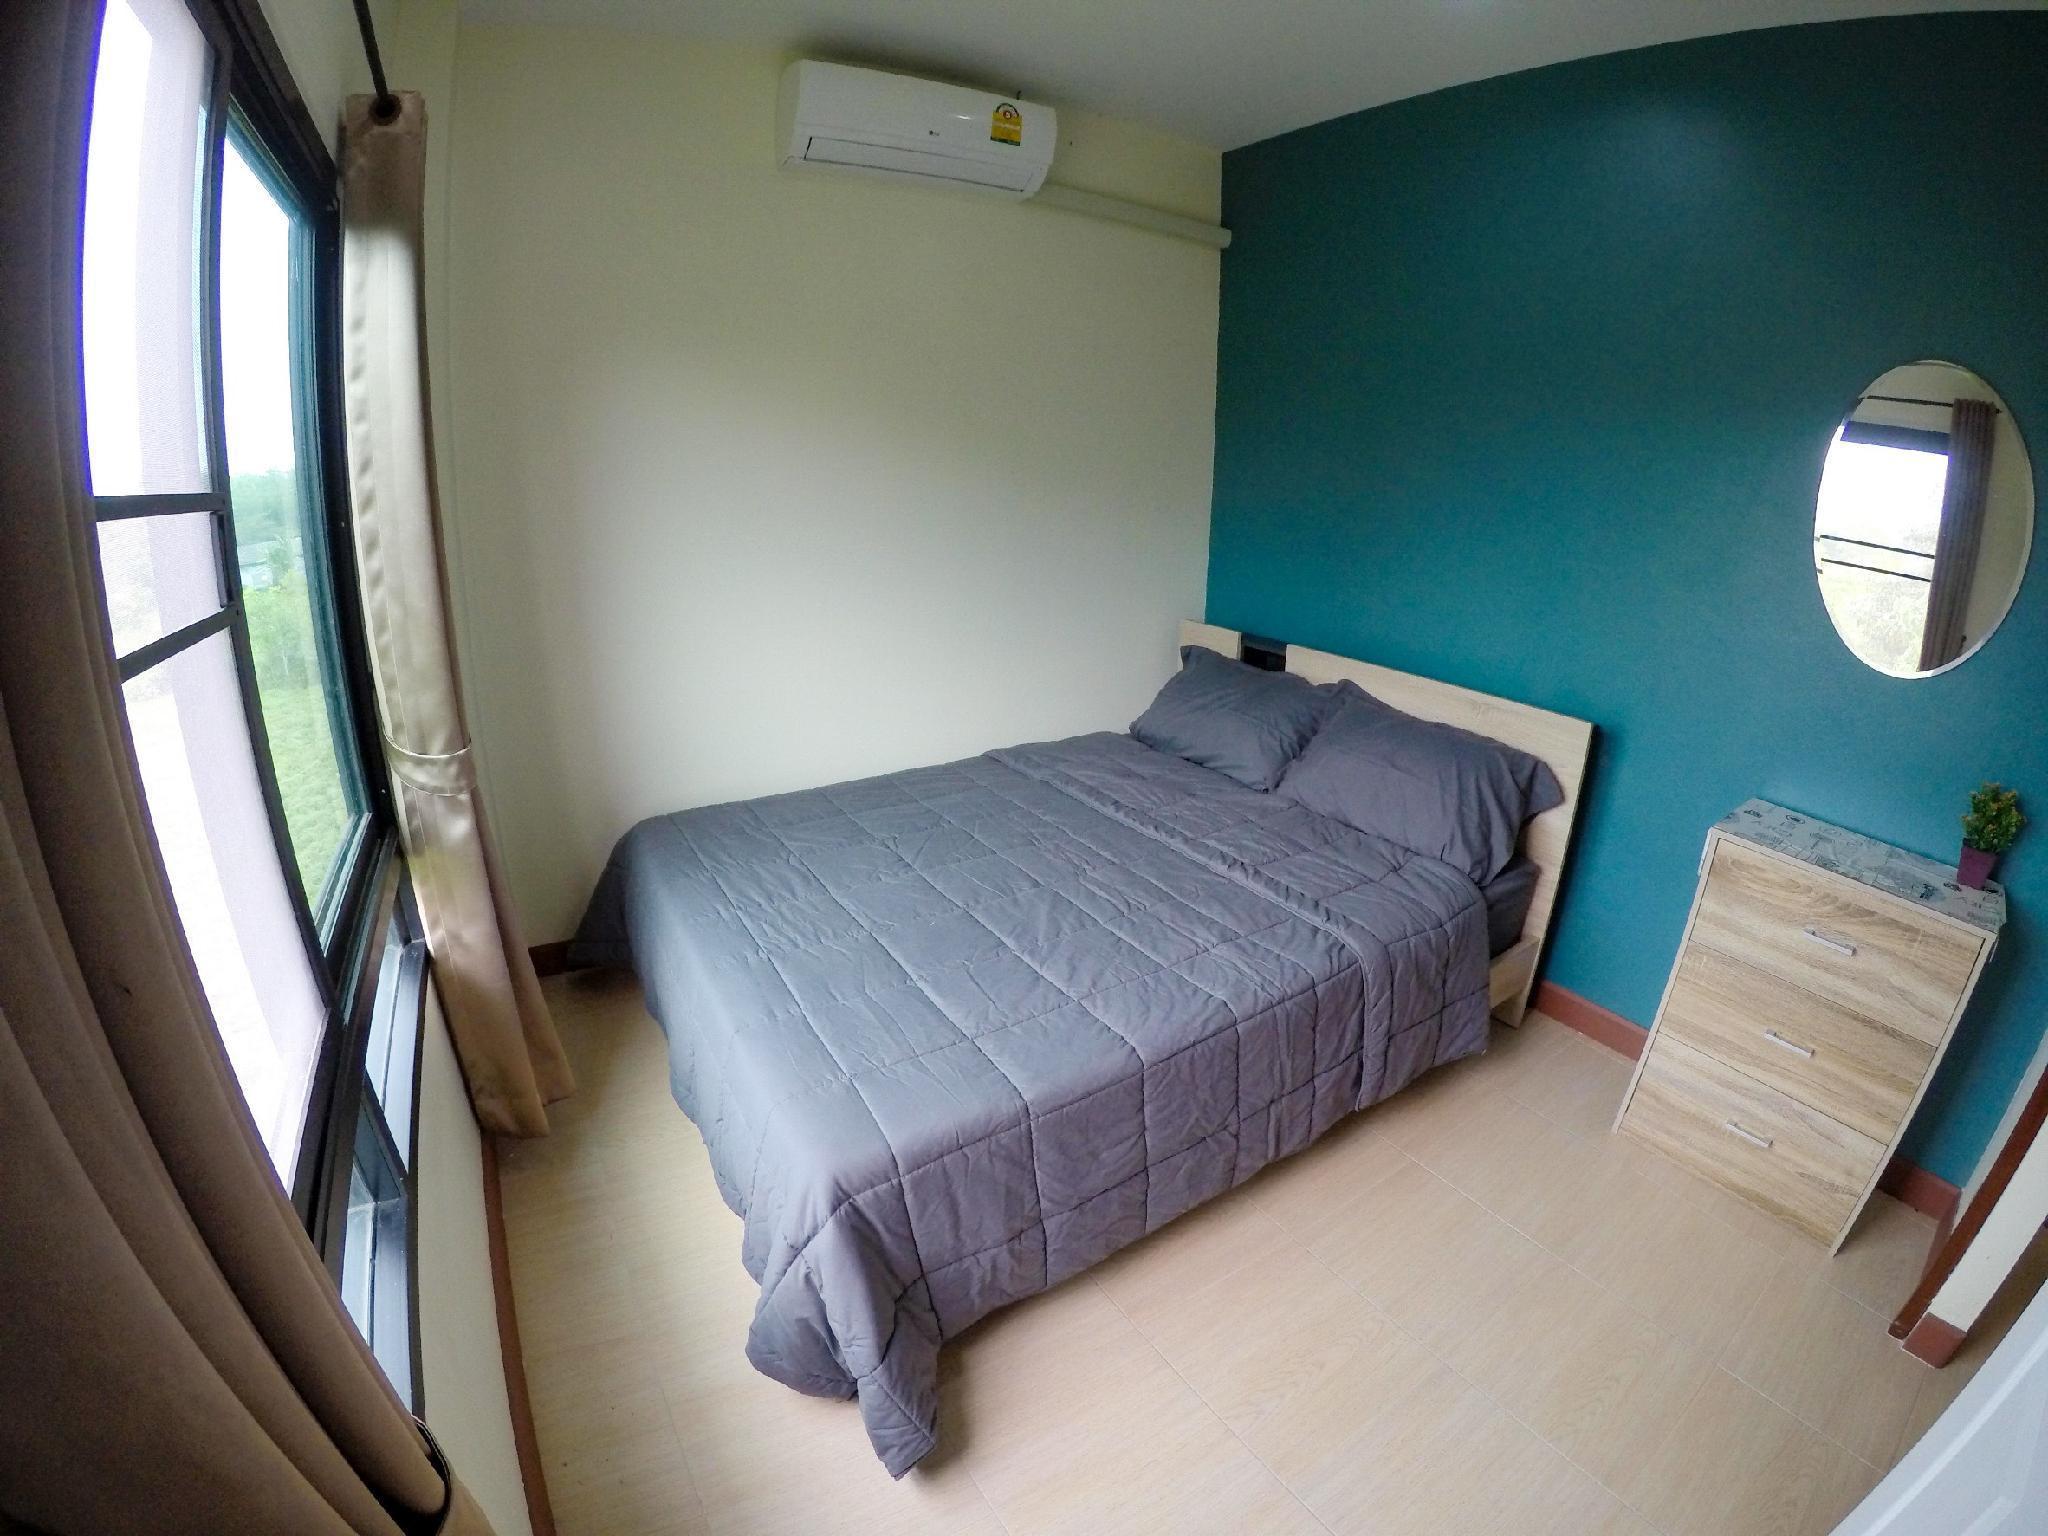 Gift House อพาร์ตเมนต์ 1 ห้องนอน 1 ห้องน้ำส่วนตัว ขนาด 33 ตร.ม. – อำเภอถลาง